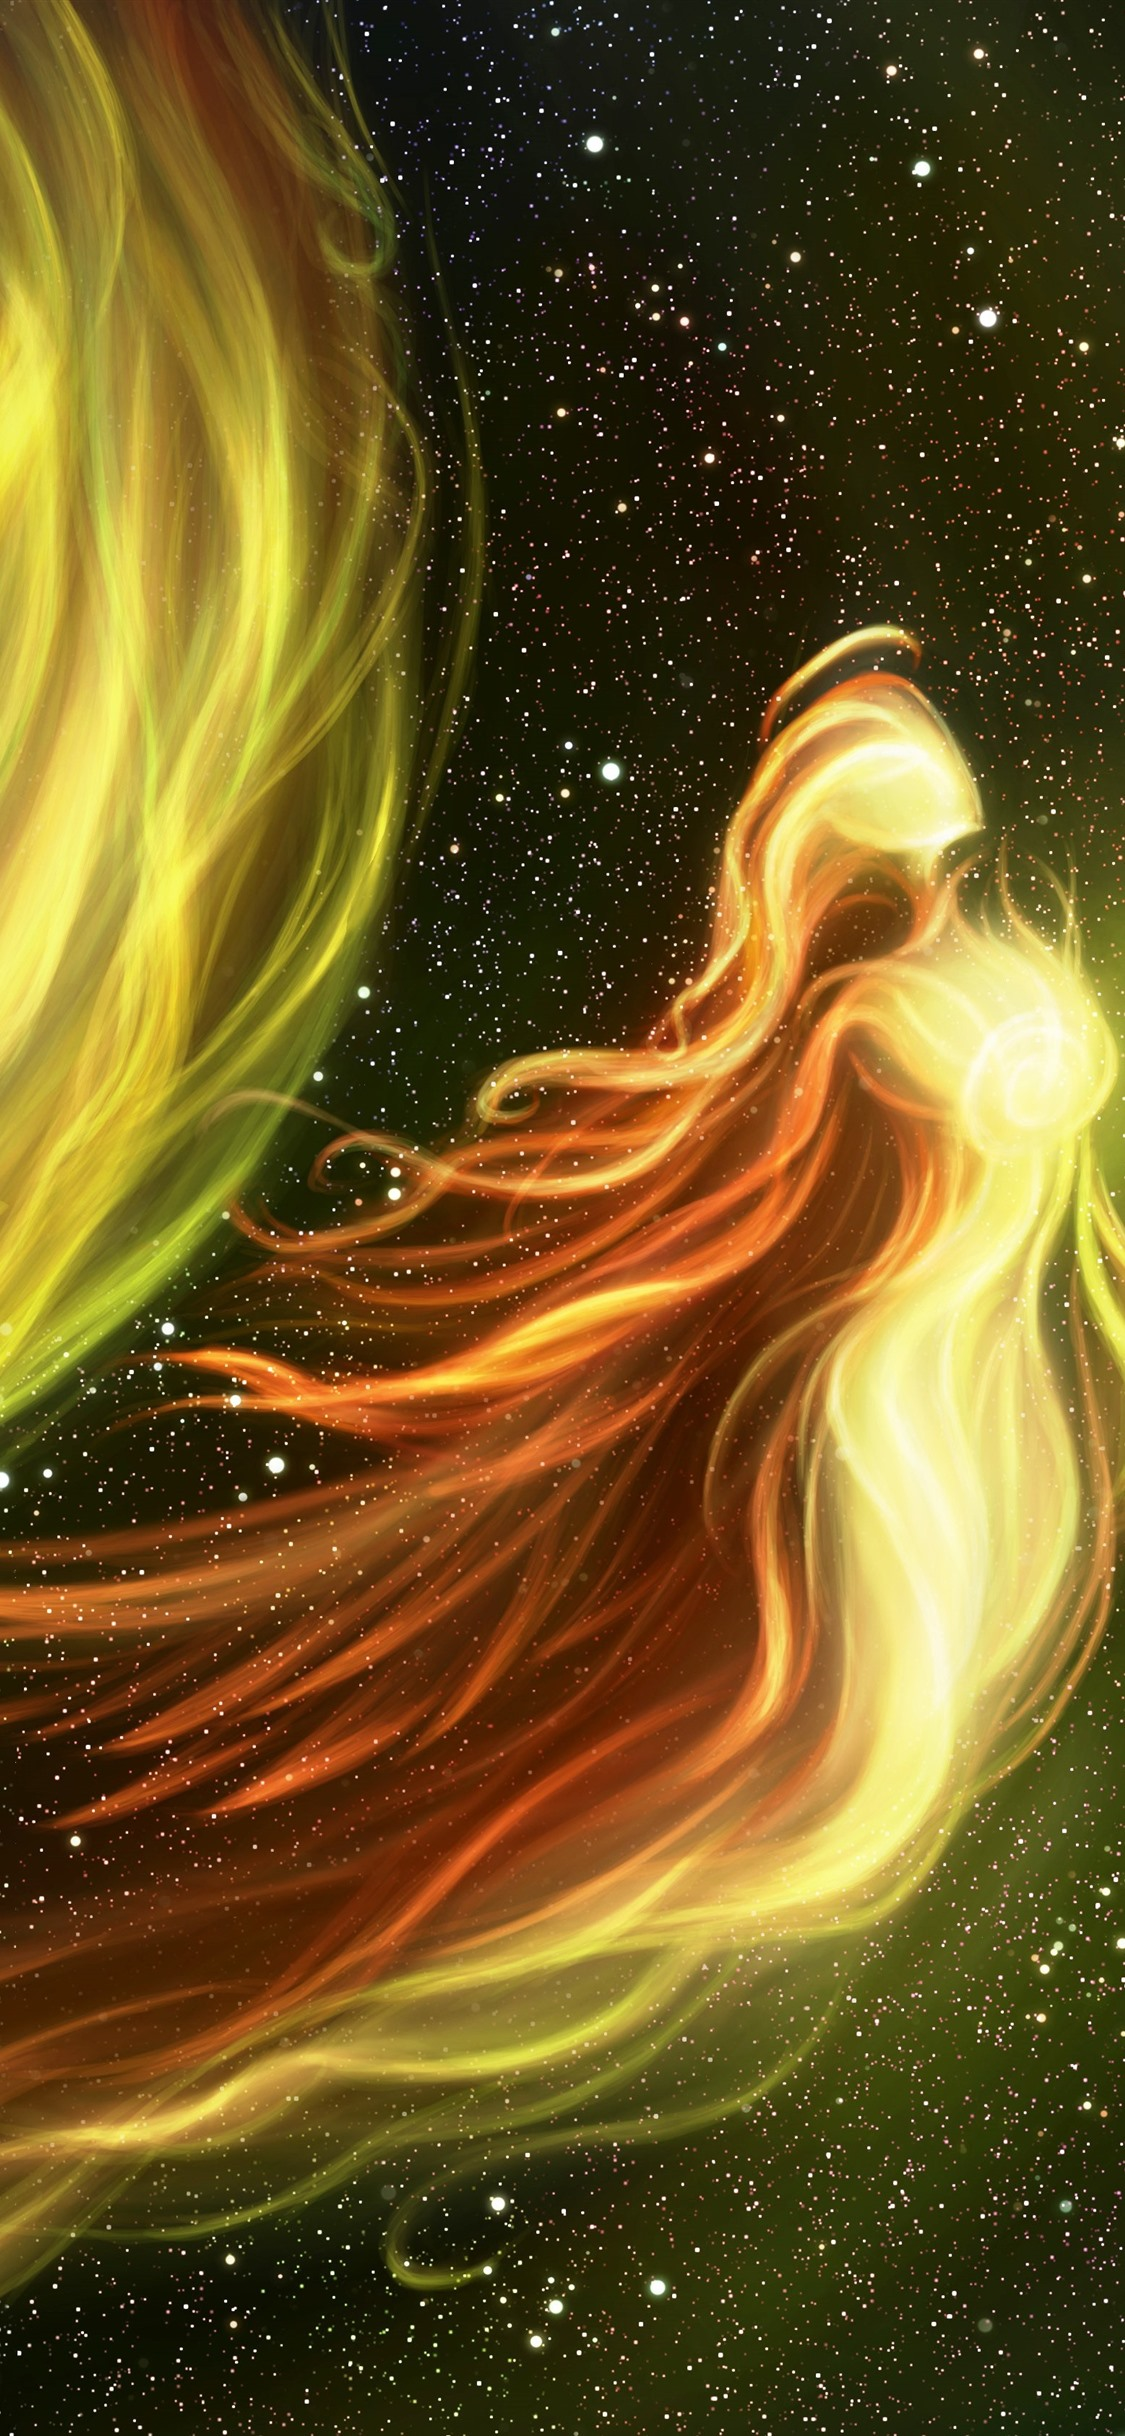 Wallpaper Starry Abstract Fire Girl Creative 3840x2160